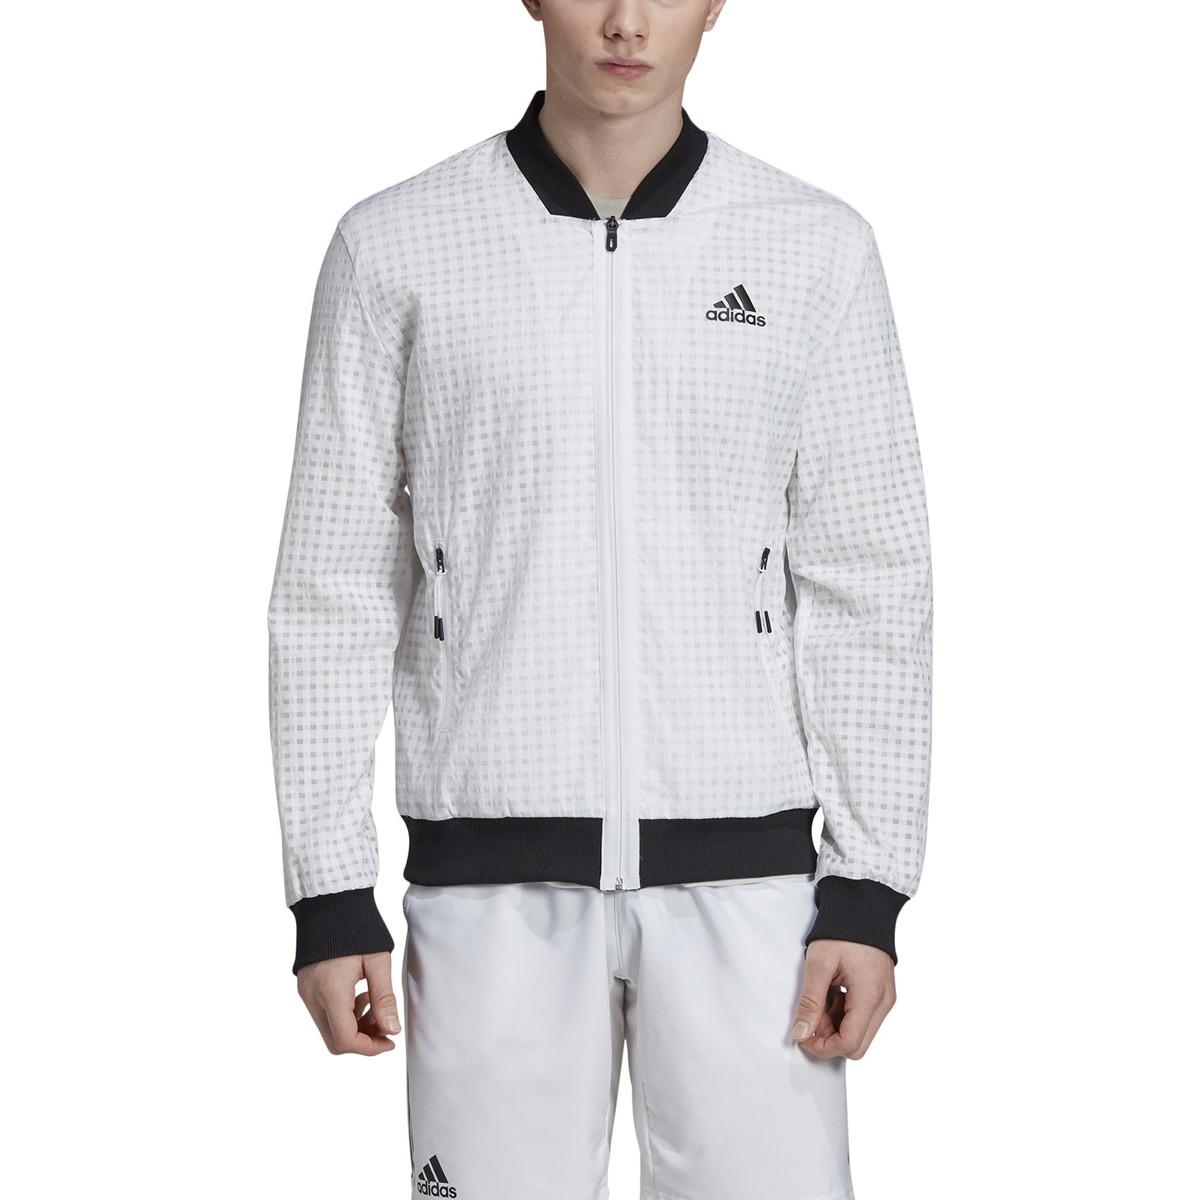 VESTE ADIDAS ESCOUADE ADIDAS Homme Vêtements | Tennispro